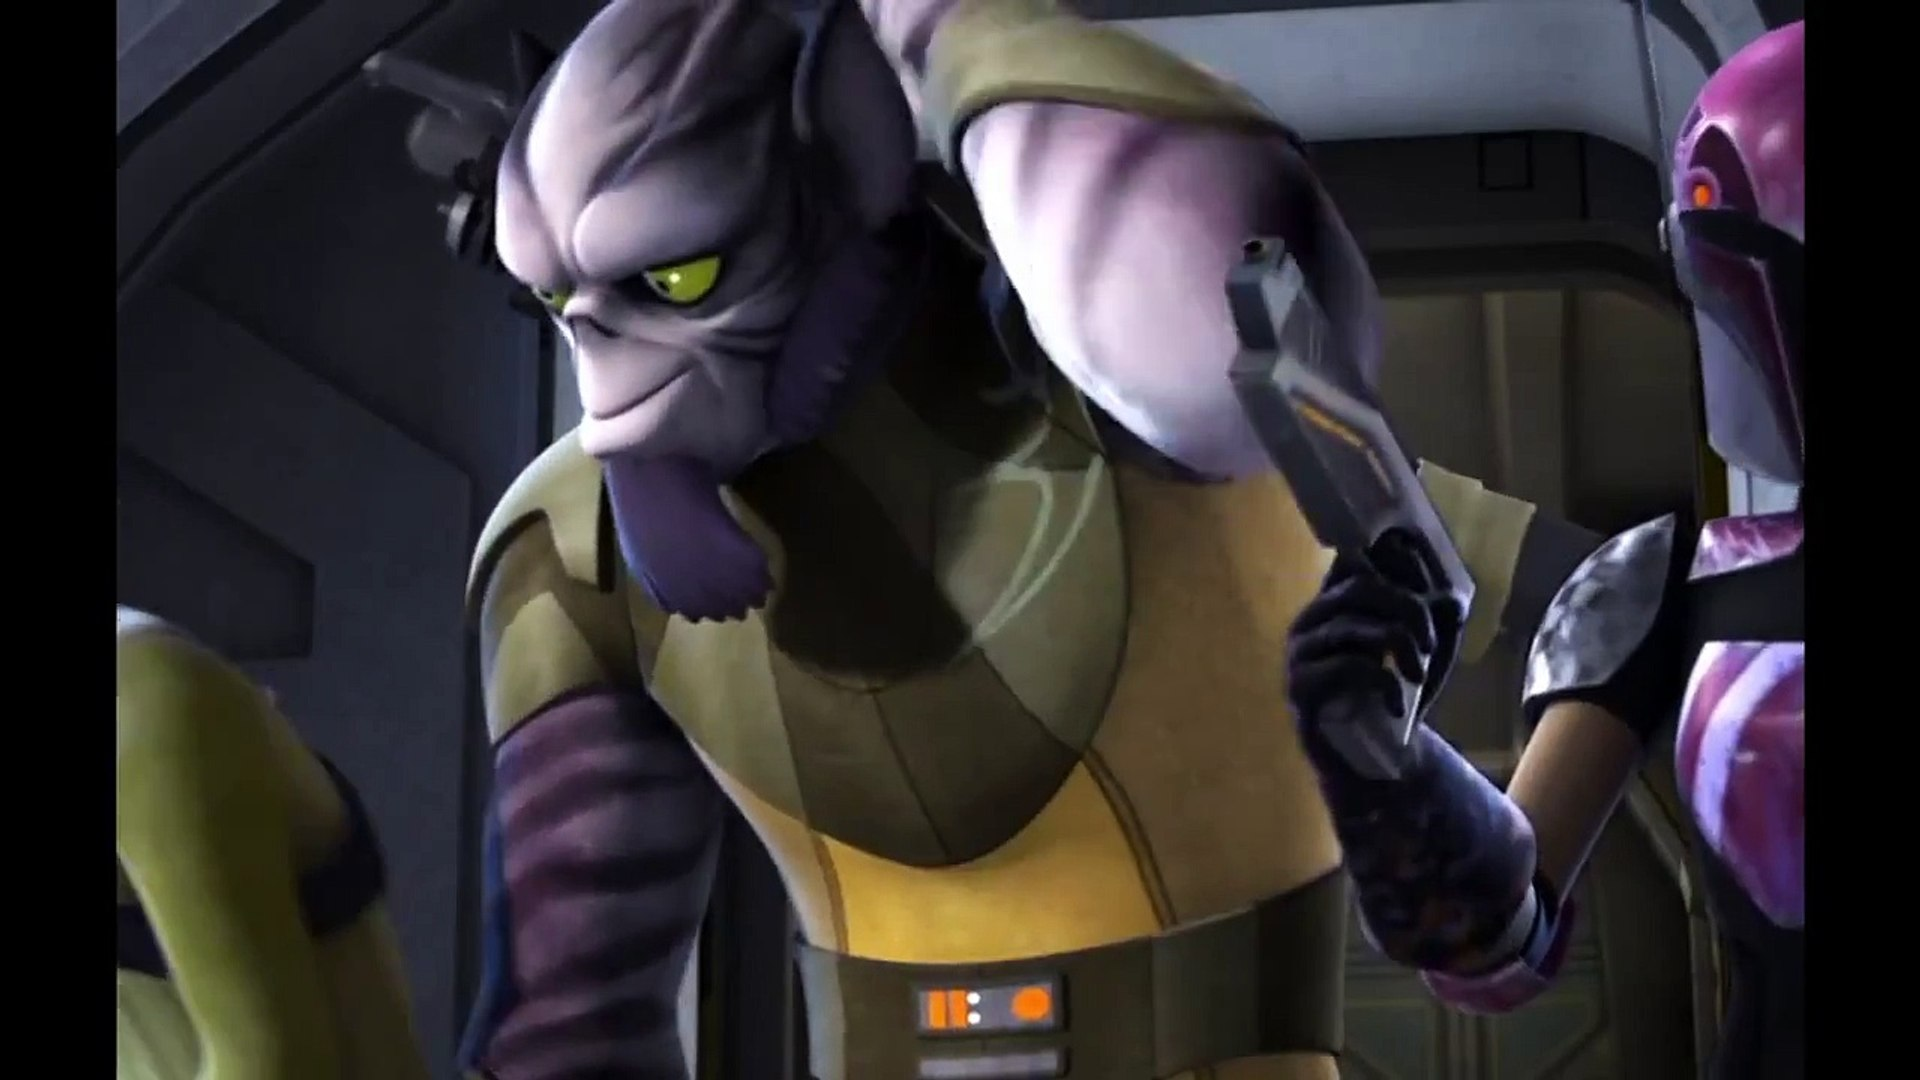 star wars rebels season 3 episode 1 torrent